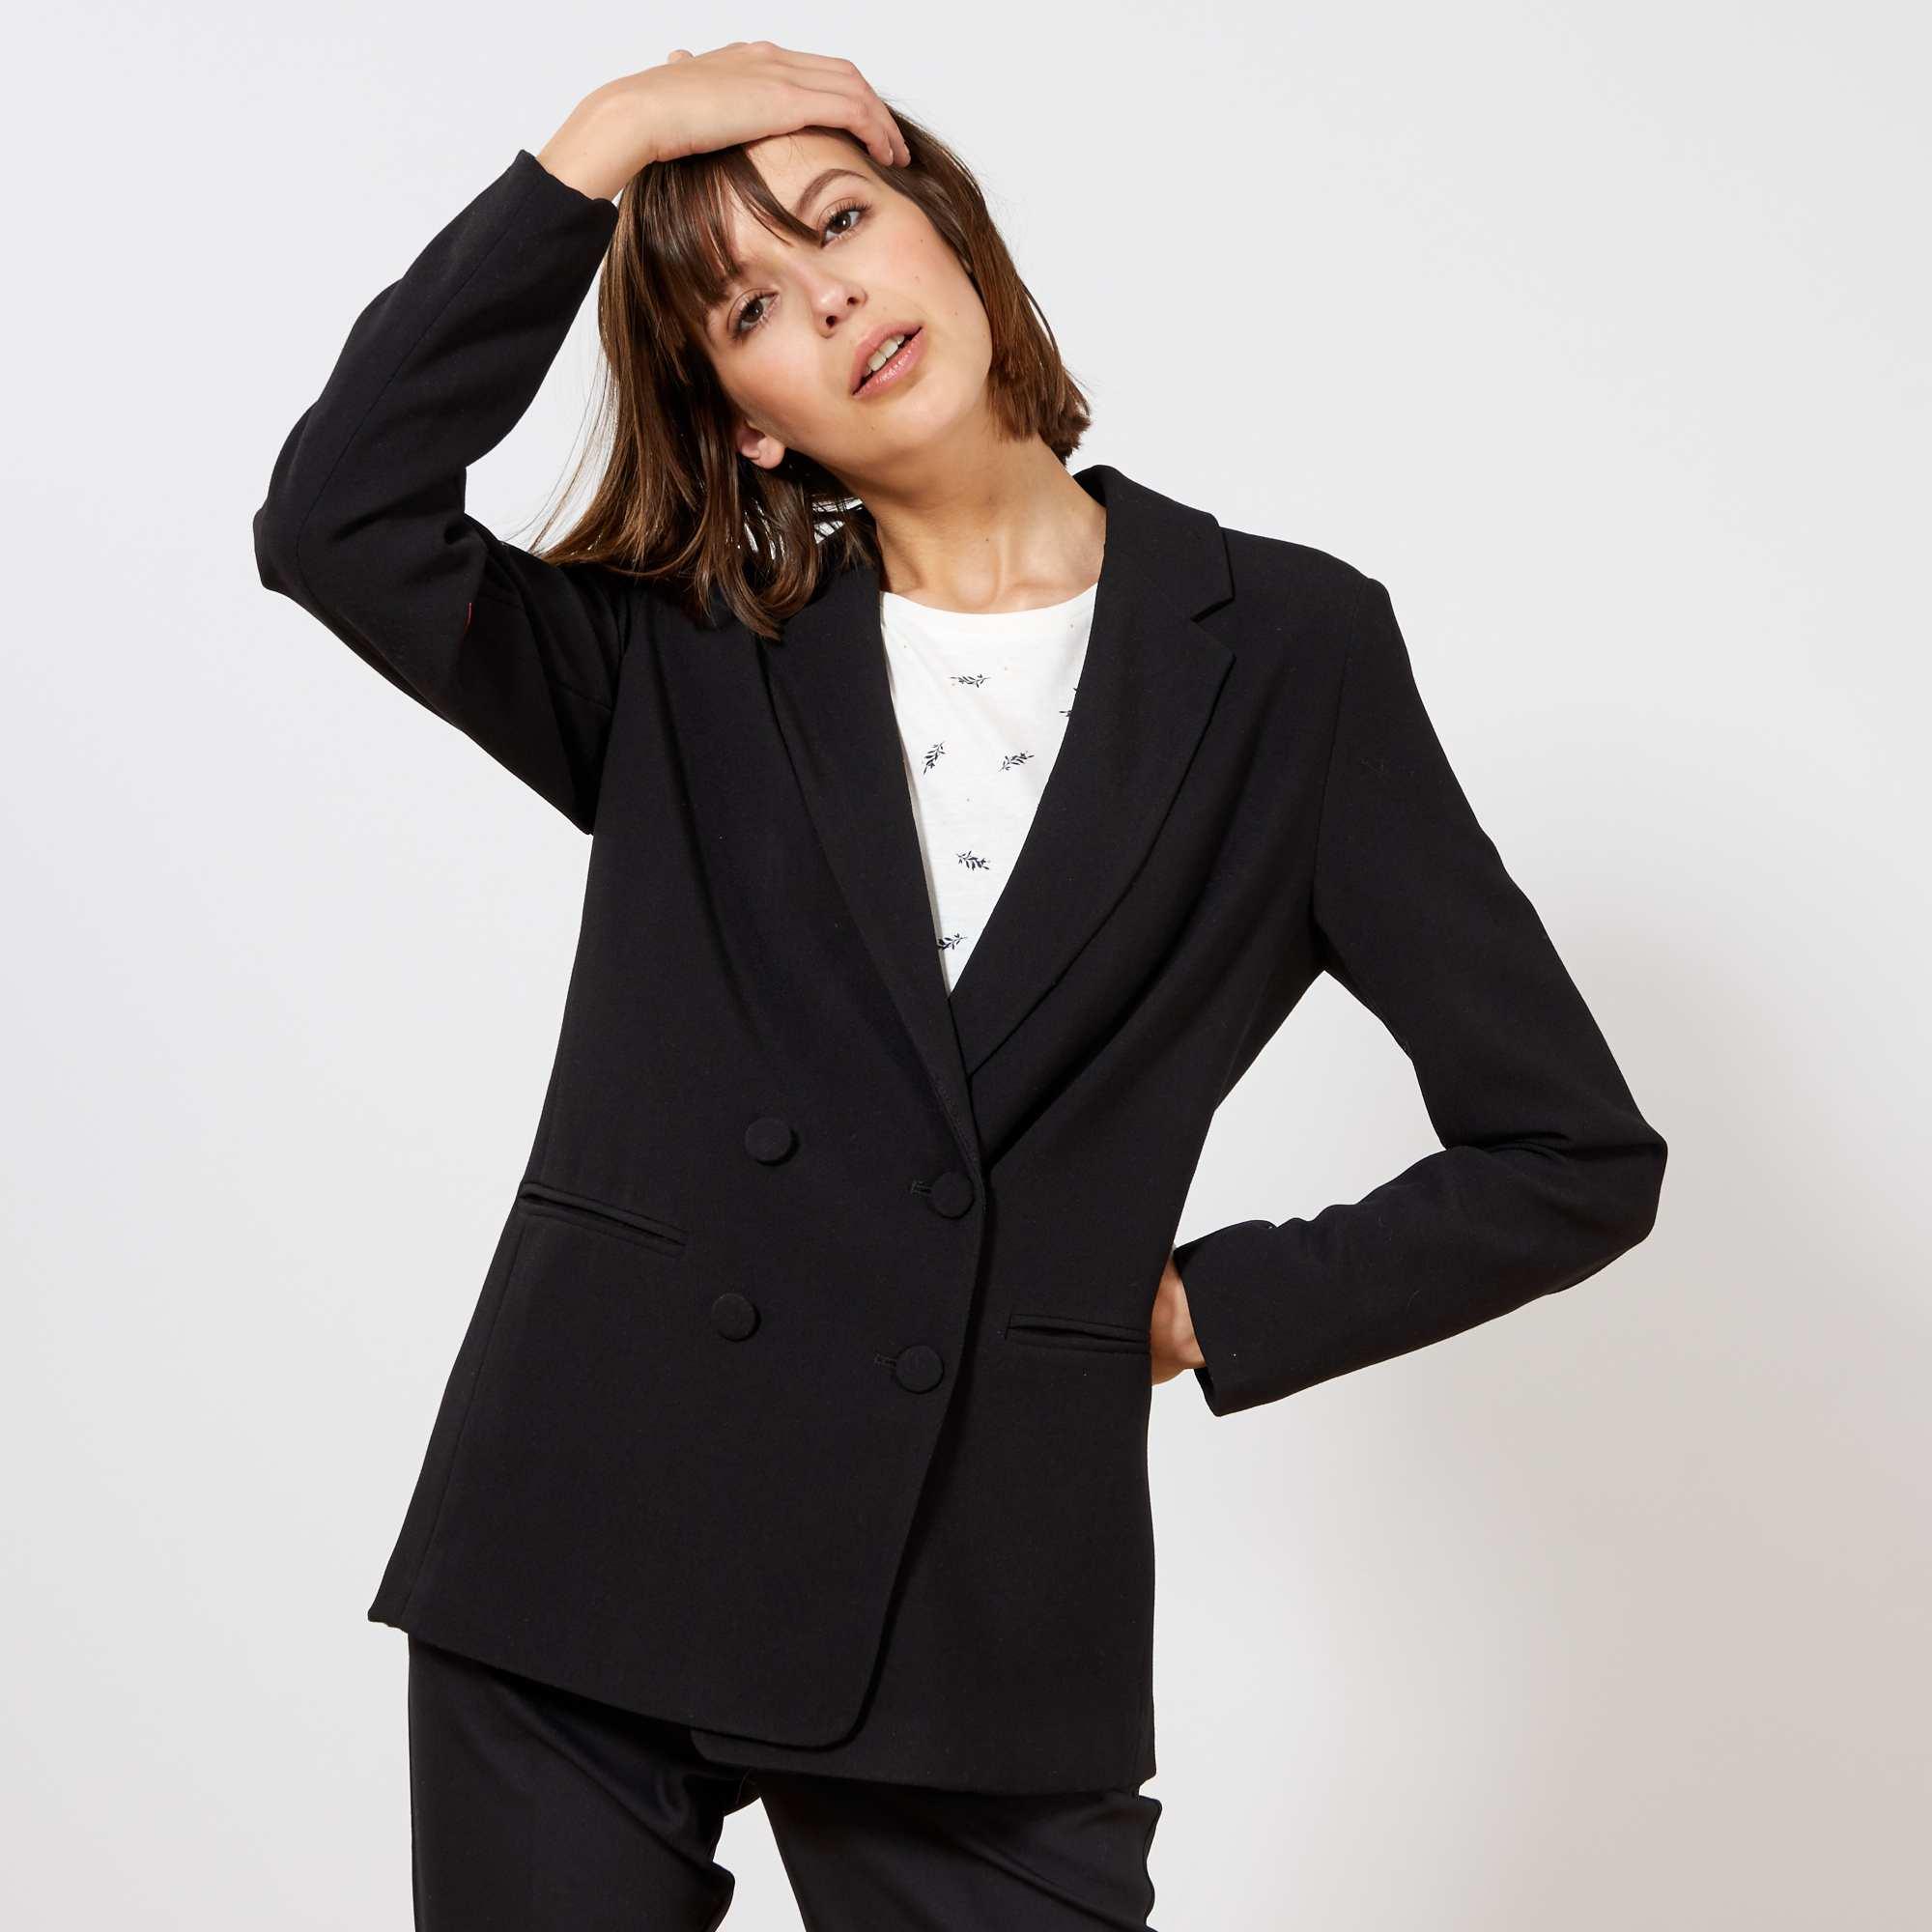 75f34ddc79 Veste blazer double boutonnage Femme - noir - Kiabi - 25,00€